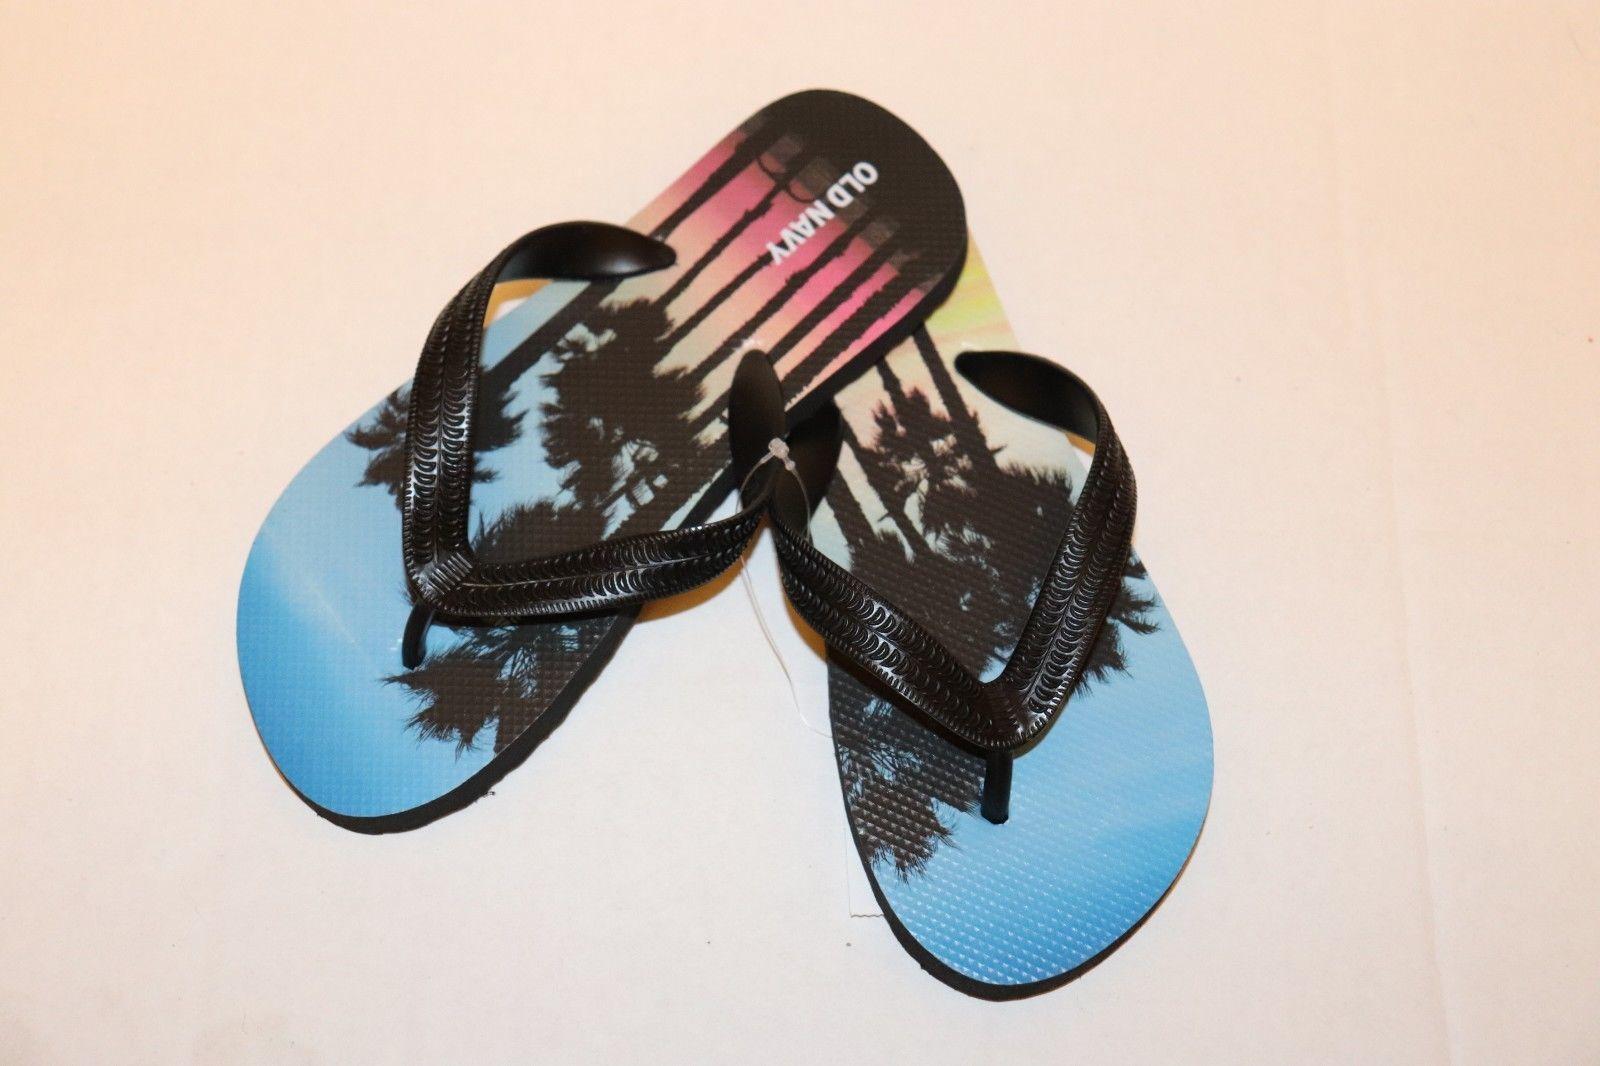 Old Navy Boys Flip Flops Shoes Size 12-13